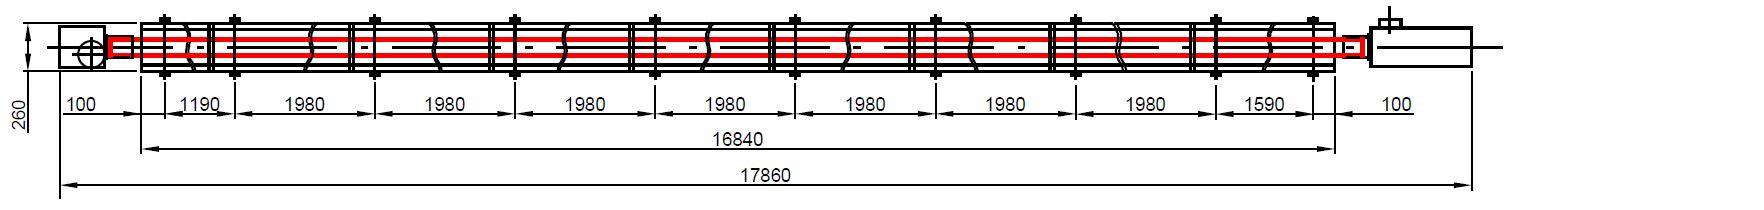 KM-30-1-17m